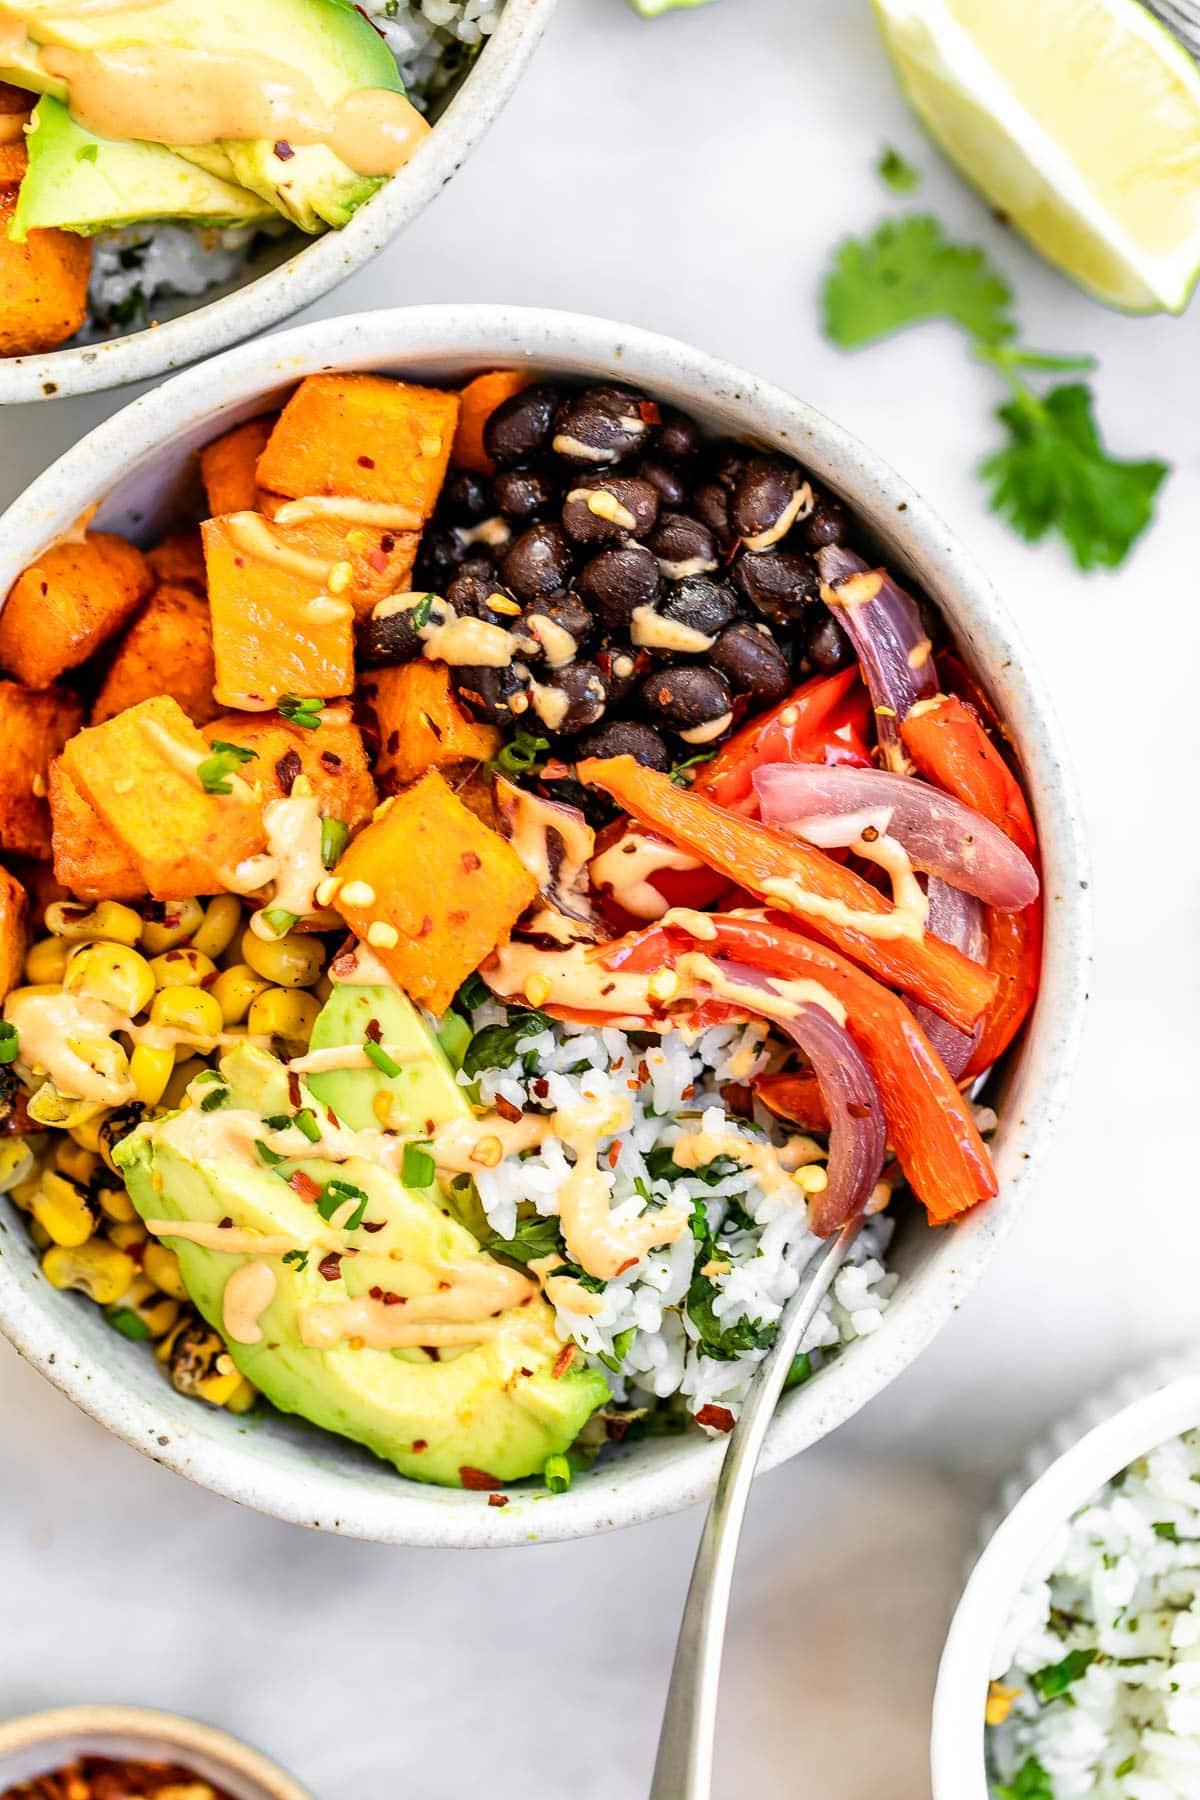 Up close image of the vegan burrito bowl.